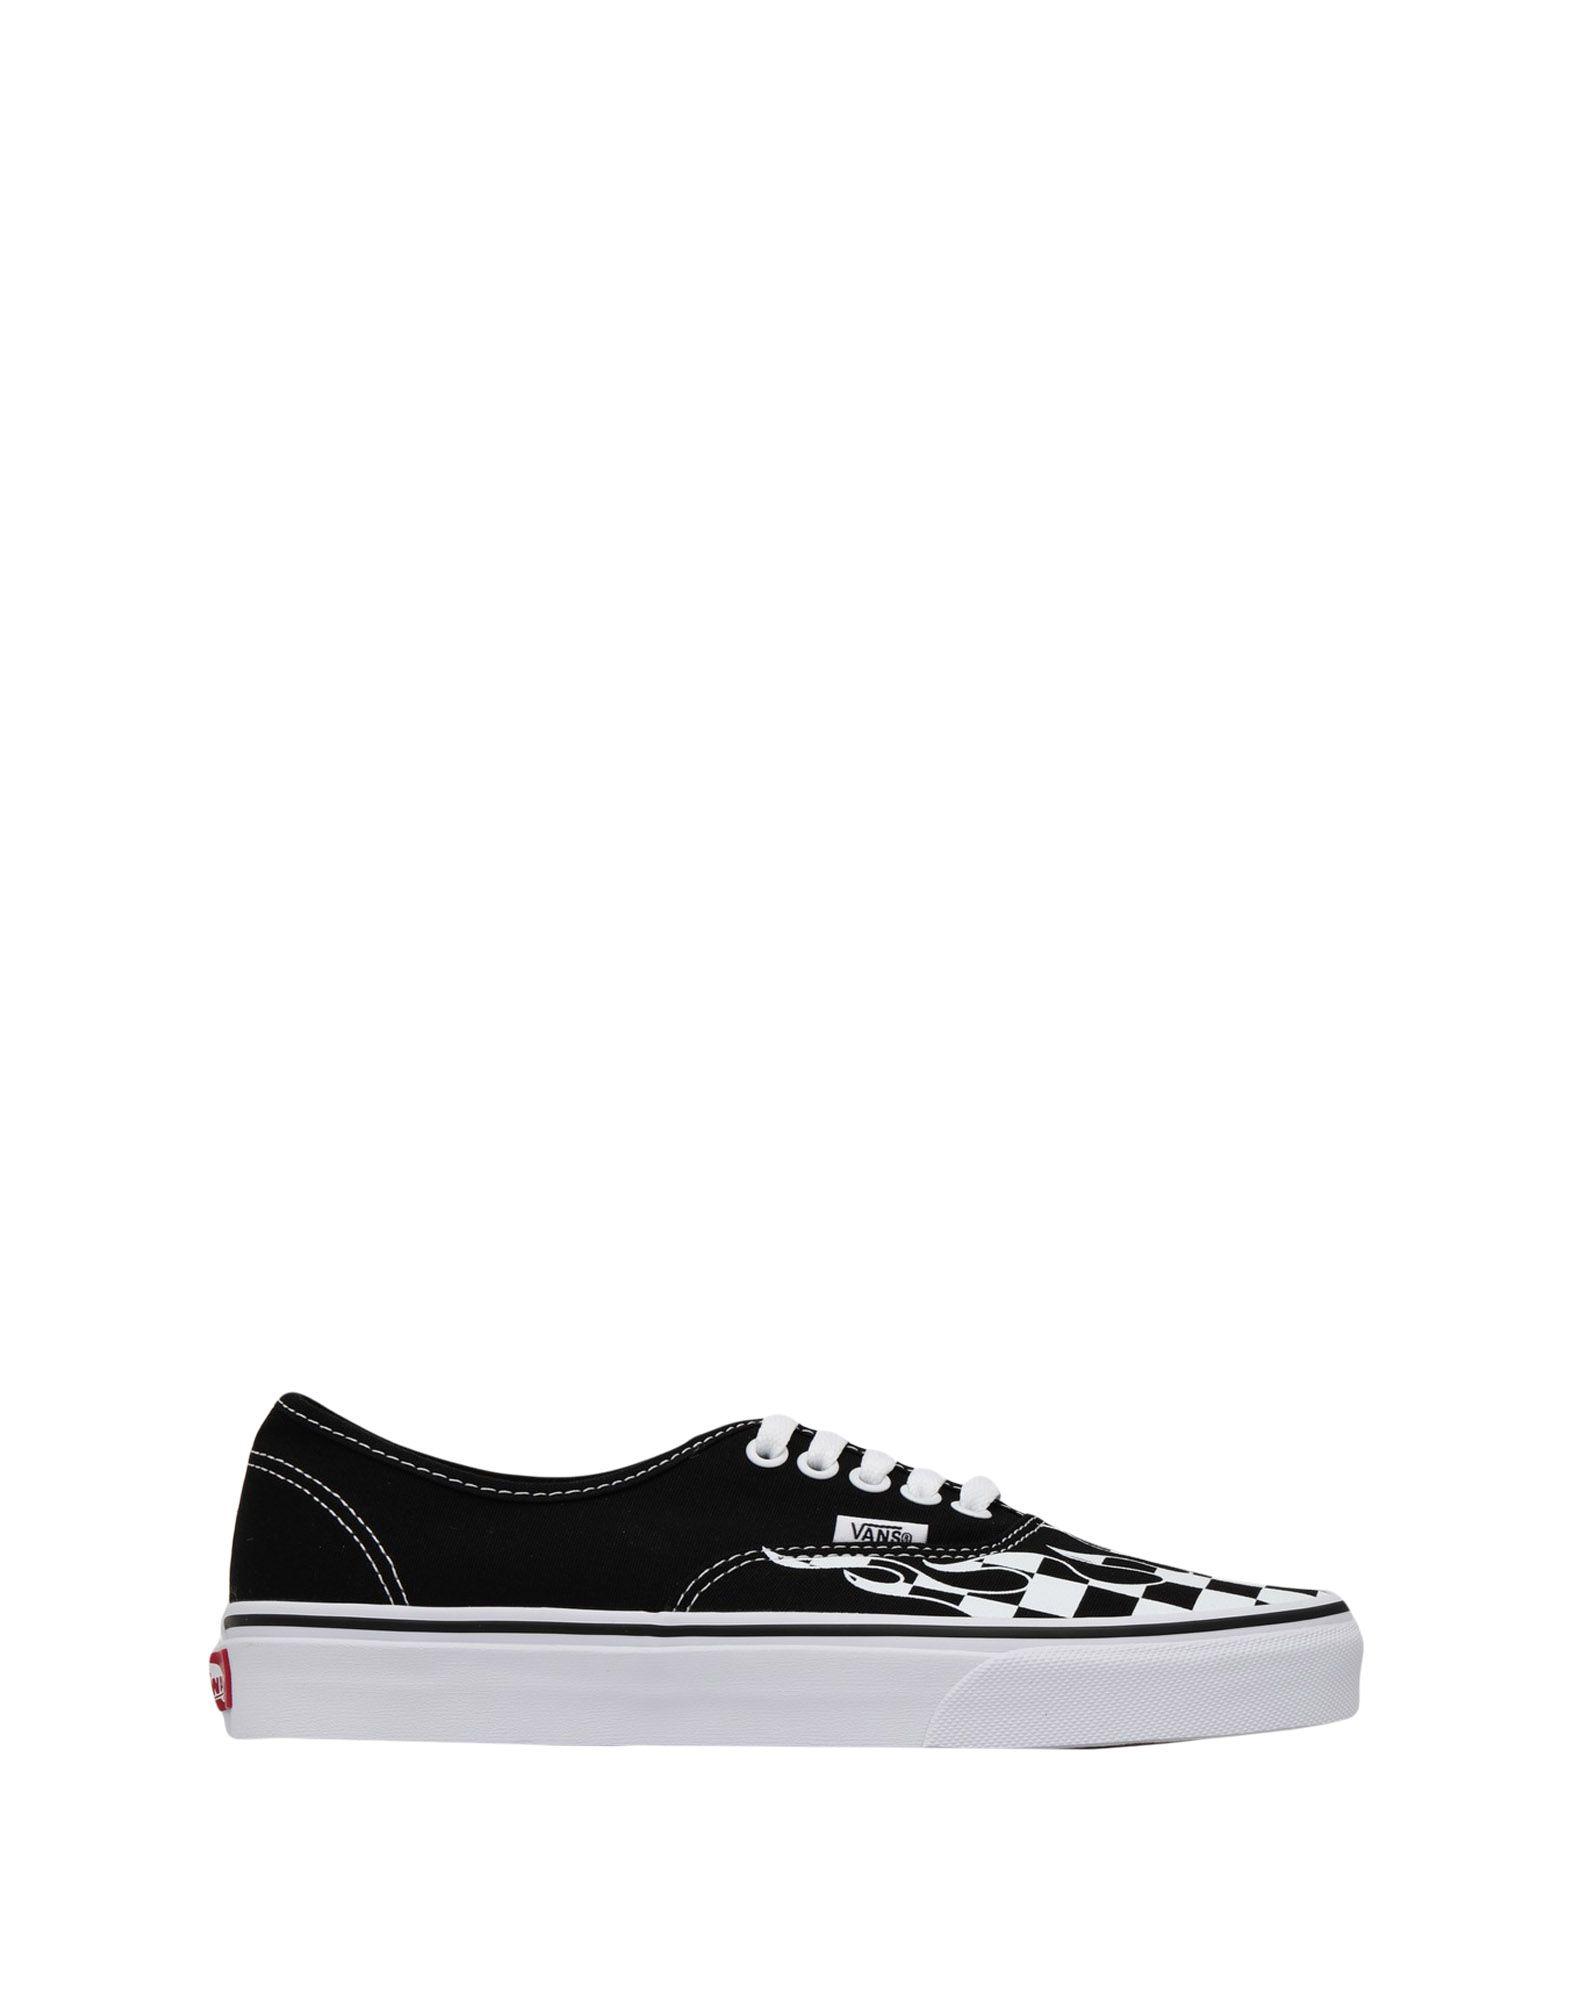 Vans Ua Authentic (Checker Women Flame) - Sneakers - Women (Checker Vans Sneakers online on  Australia - 11559674FD 6e0c84